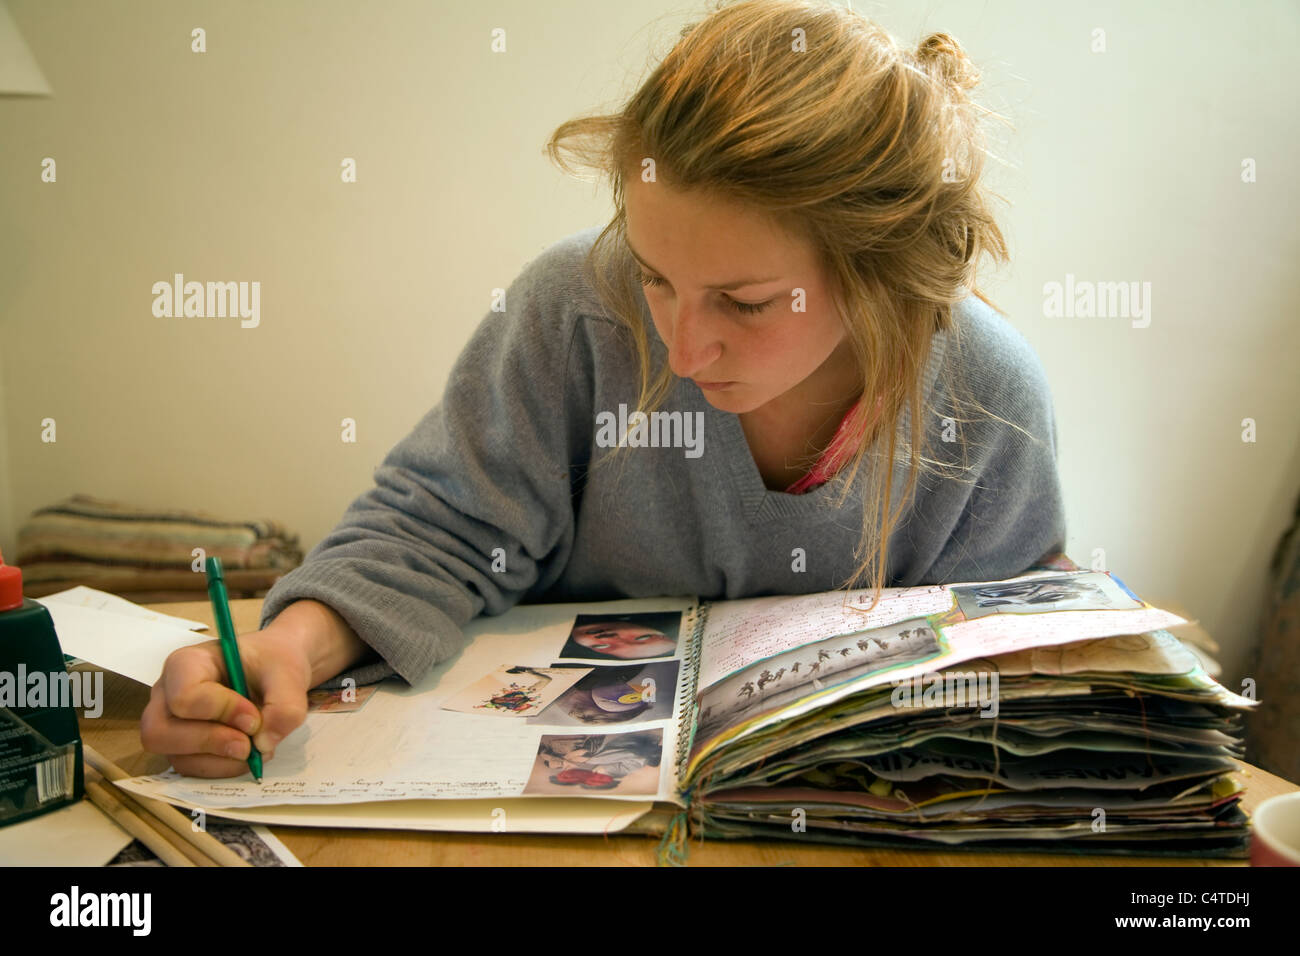 Model released image of teenage girl working on her art folder - Stock Image